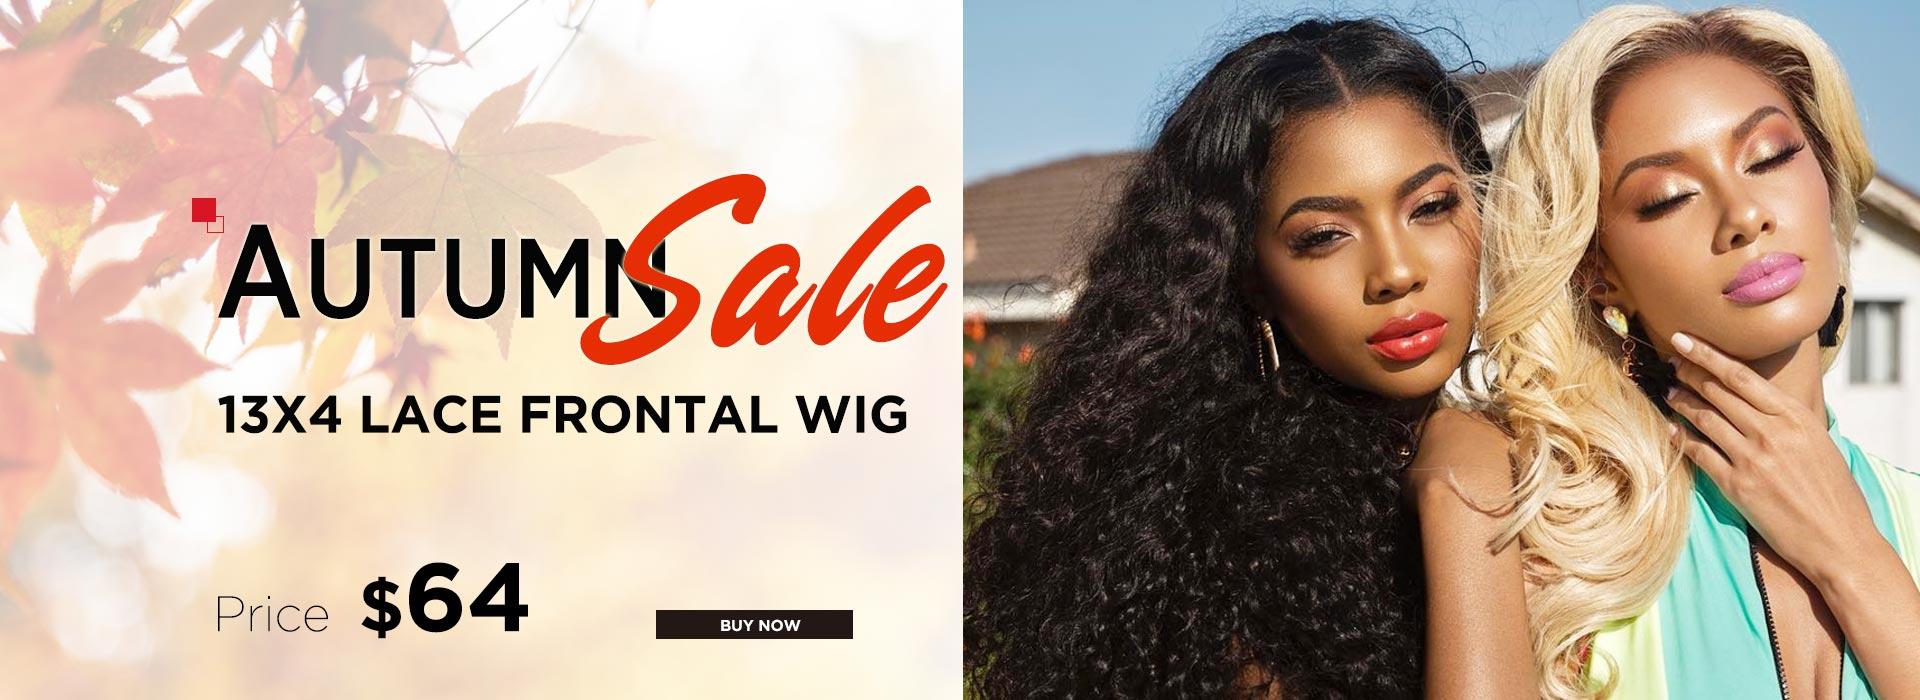 13x4 lace wigs